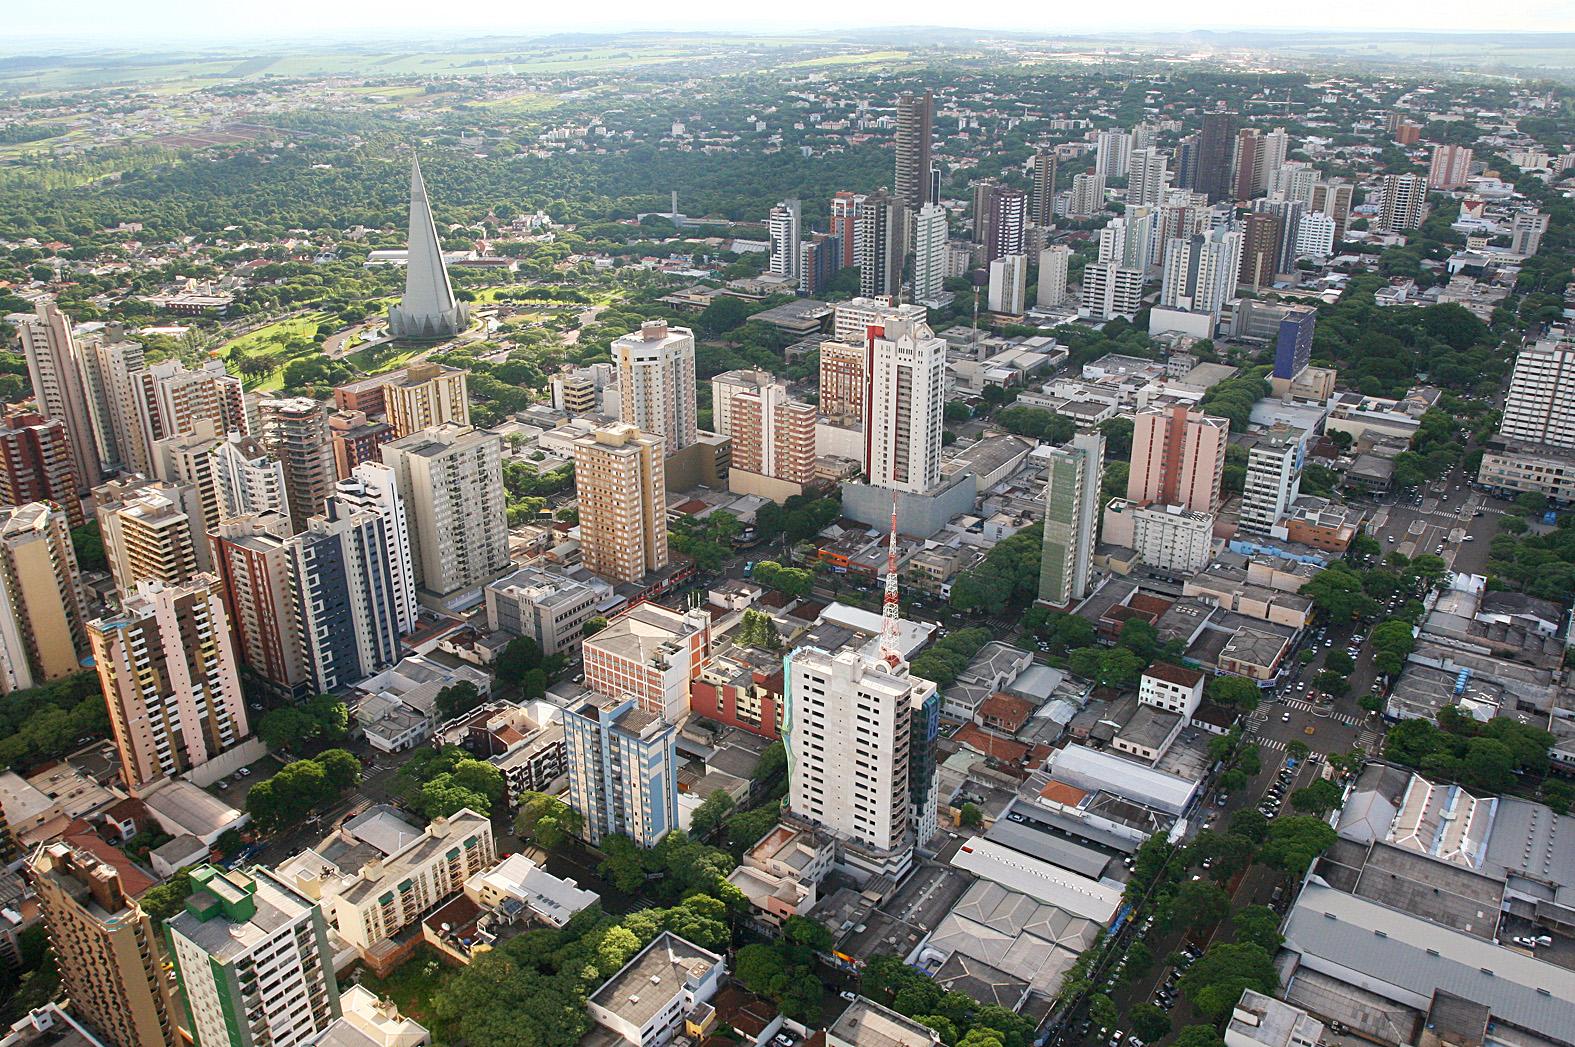 Análise cidade de Maringá/PR